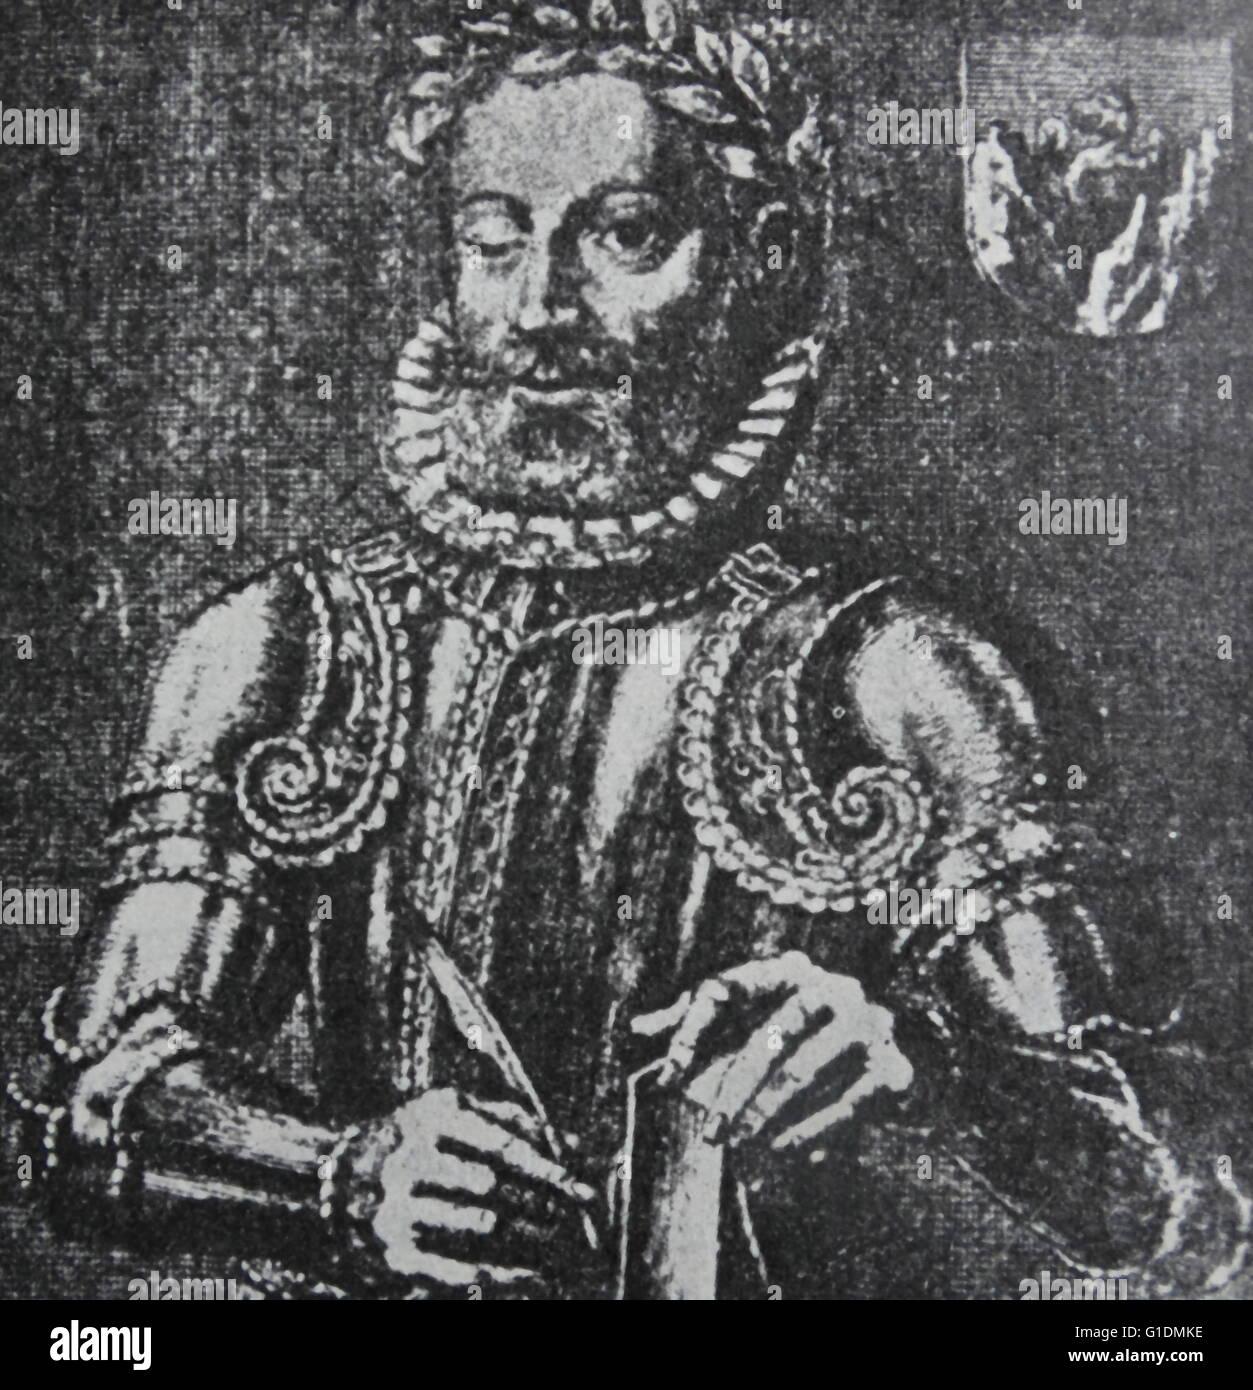 Ein Portugiese datiert Mekomos datiert